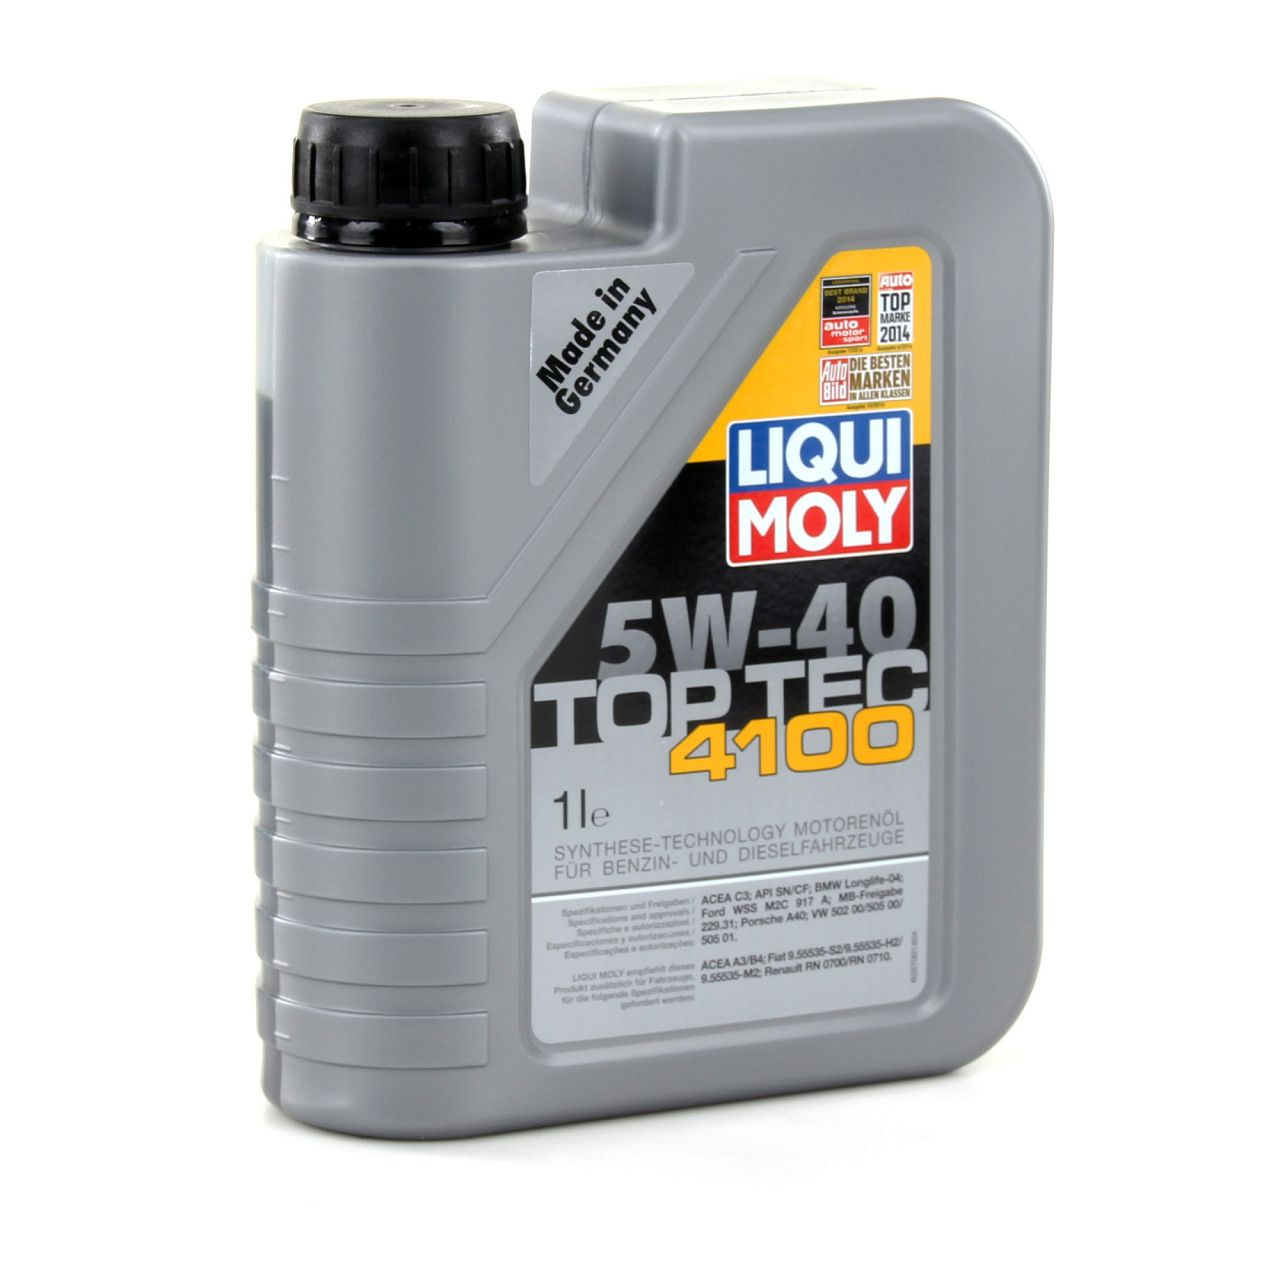 LIQUI MOLY Motoröl Öl TOP TEC 4100 5W40 5W-40 6L 6Liter 3700 + 3701